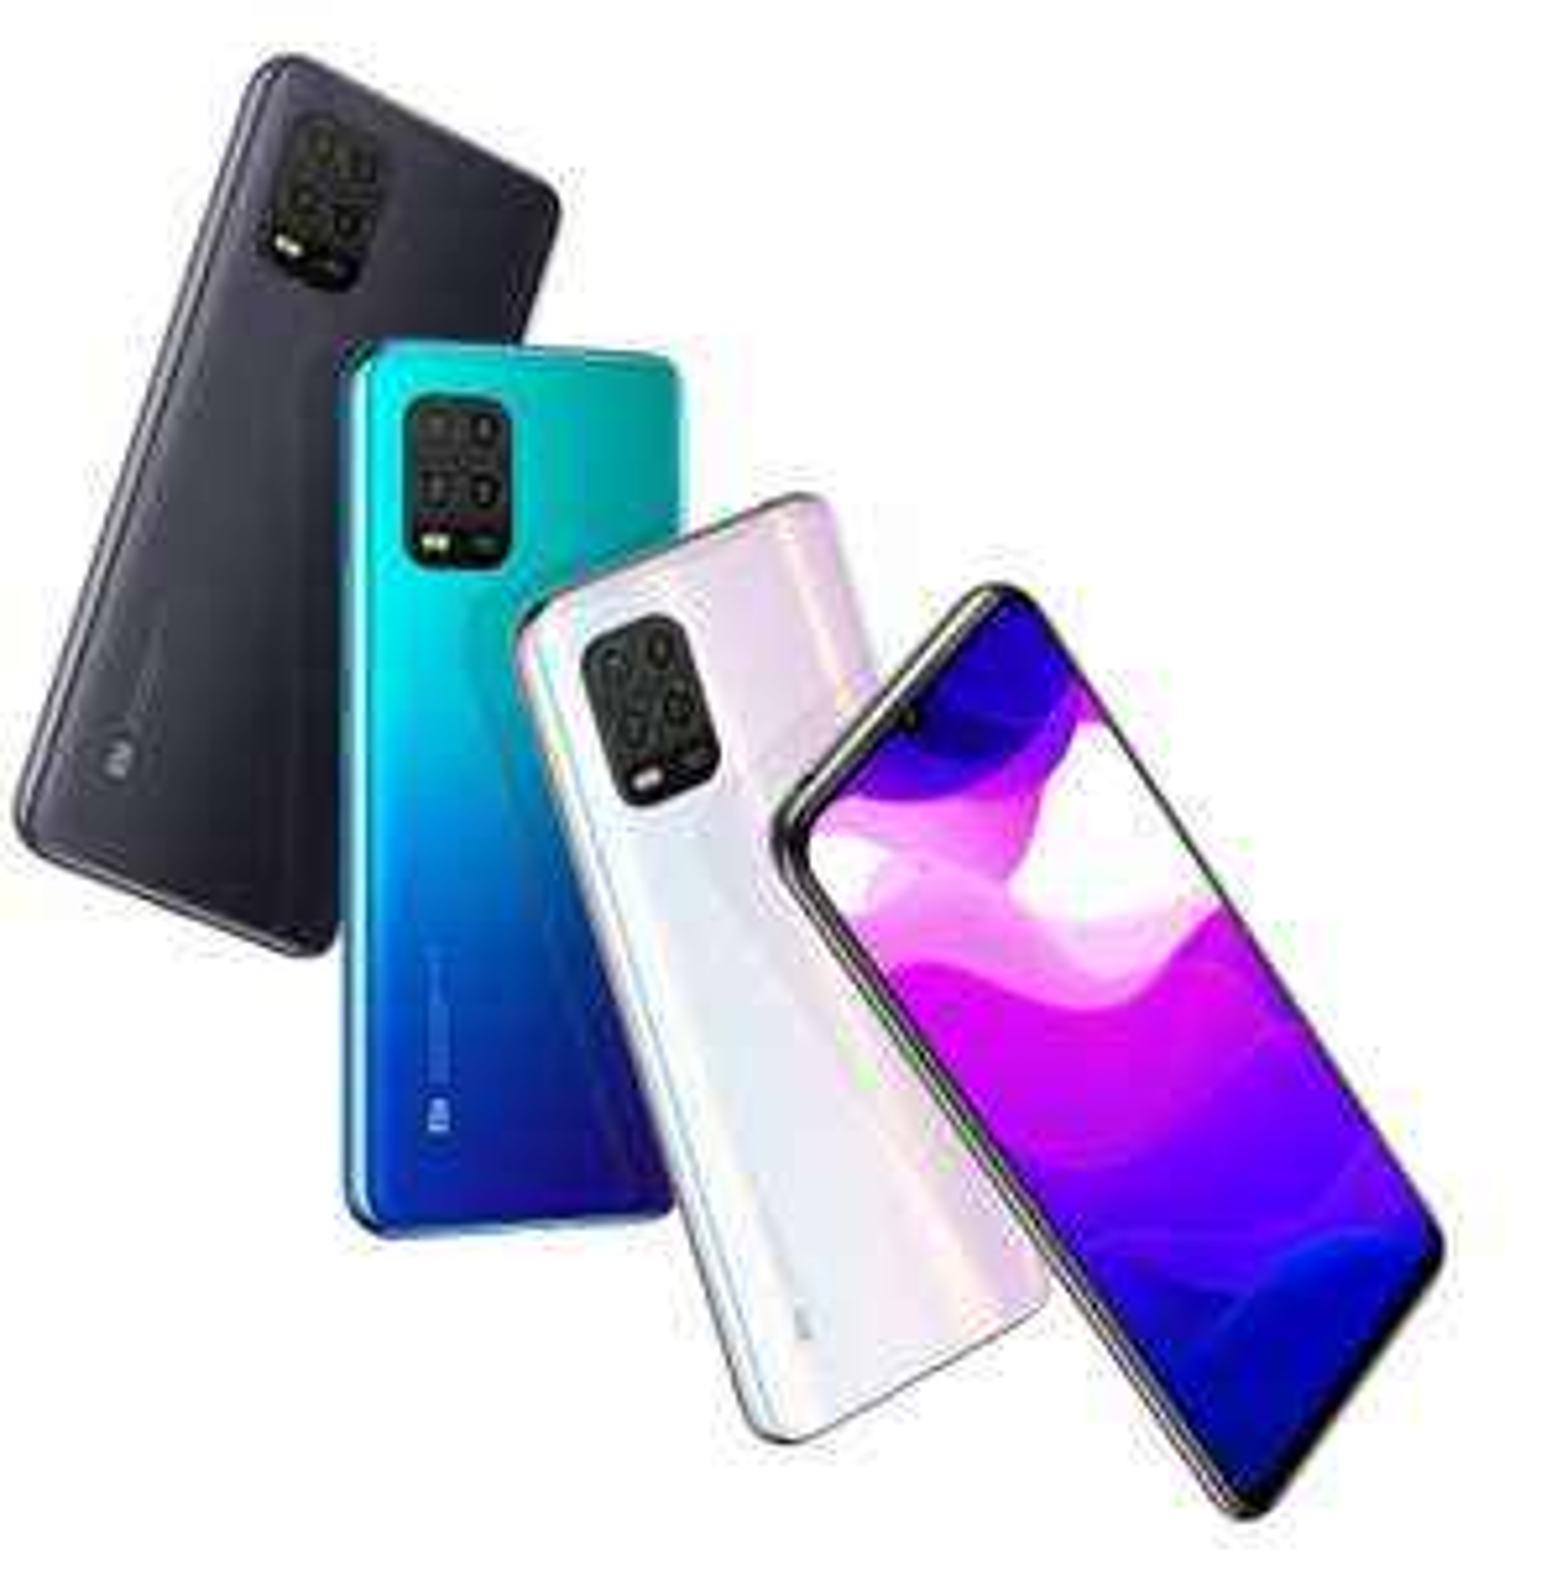 "Xiaomi Mi 10 Lite Unlocked 5G Phone (6.57"" AMOLED, 6GB RAM, 48MP, Dual Nano-SIM) - Grey, Blue, White for £243.80 delivered @ Amazon France"